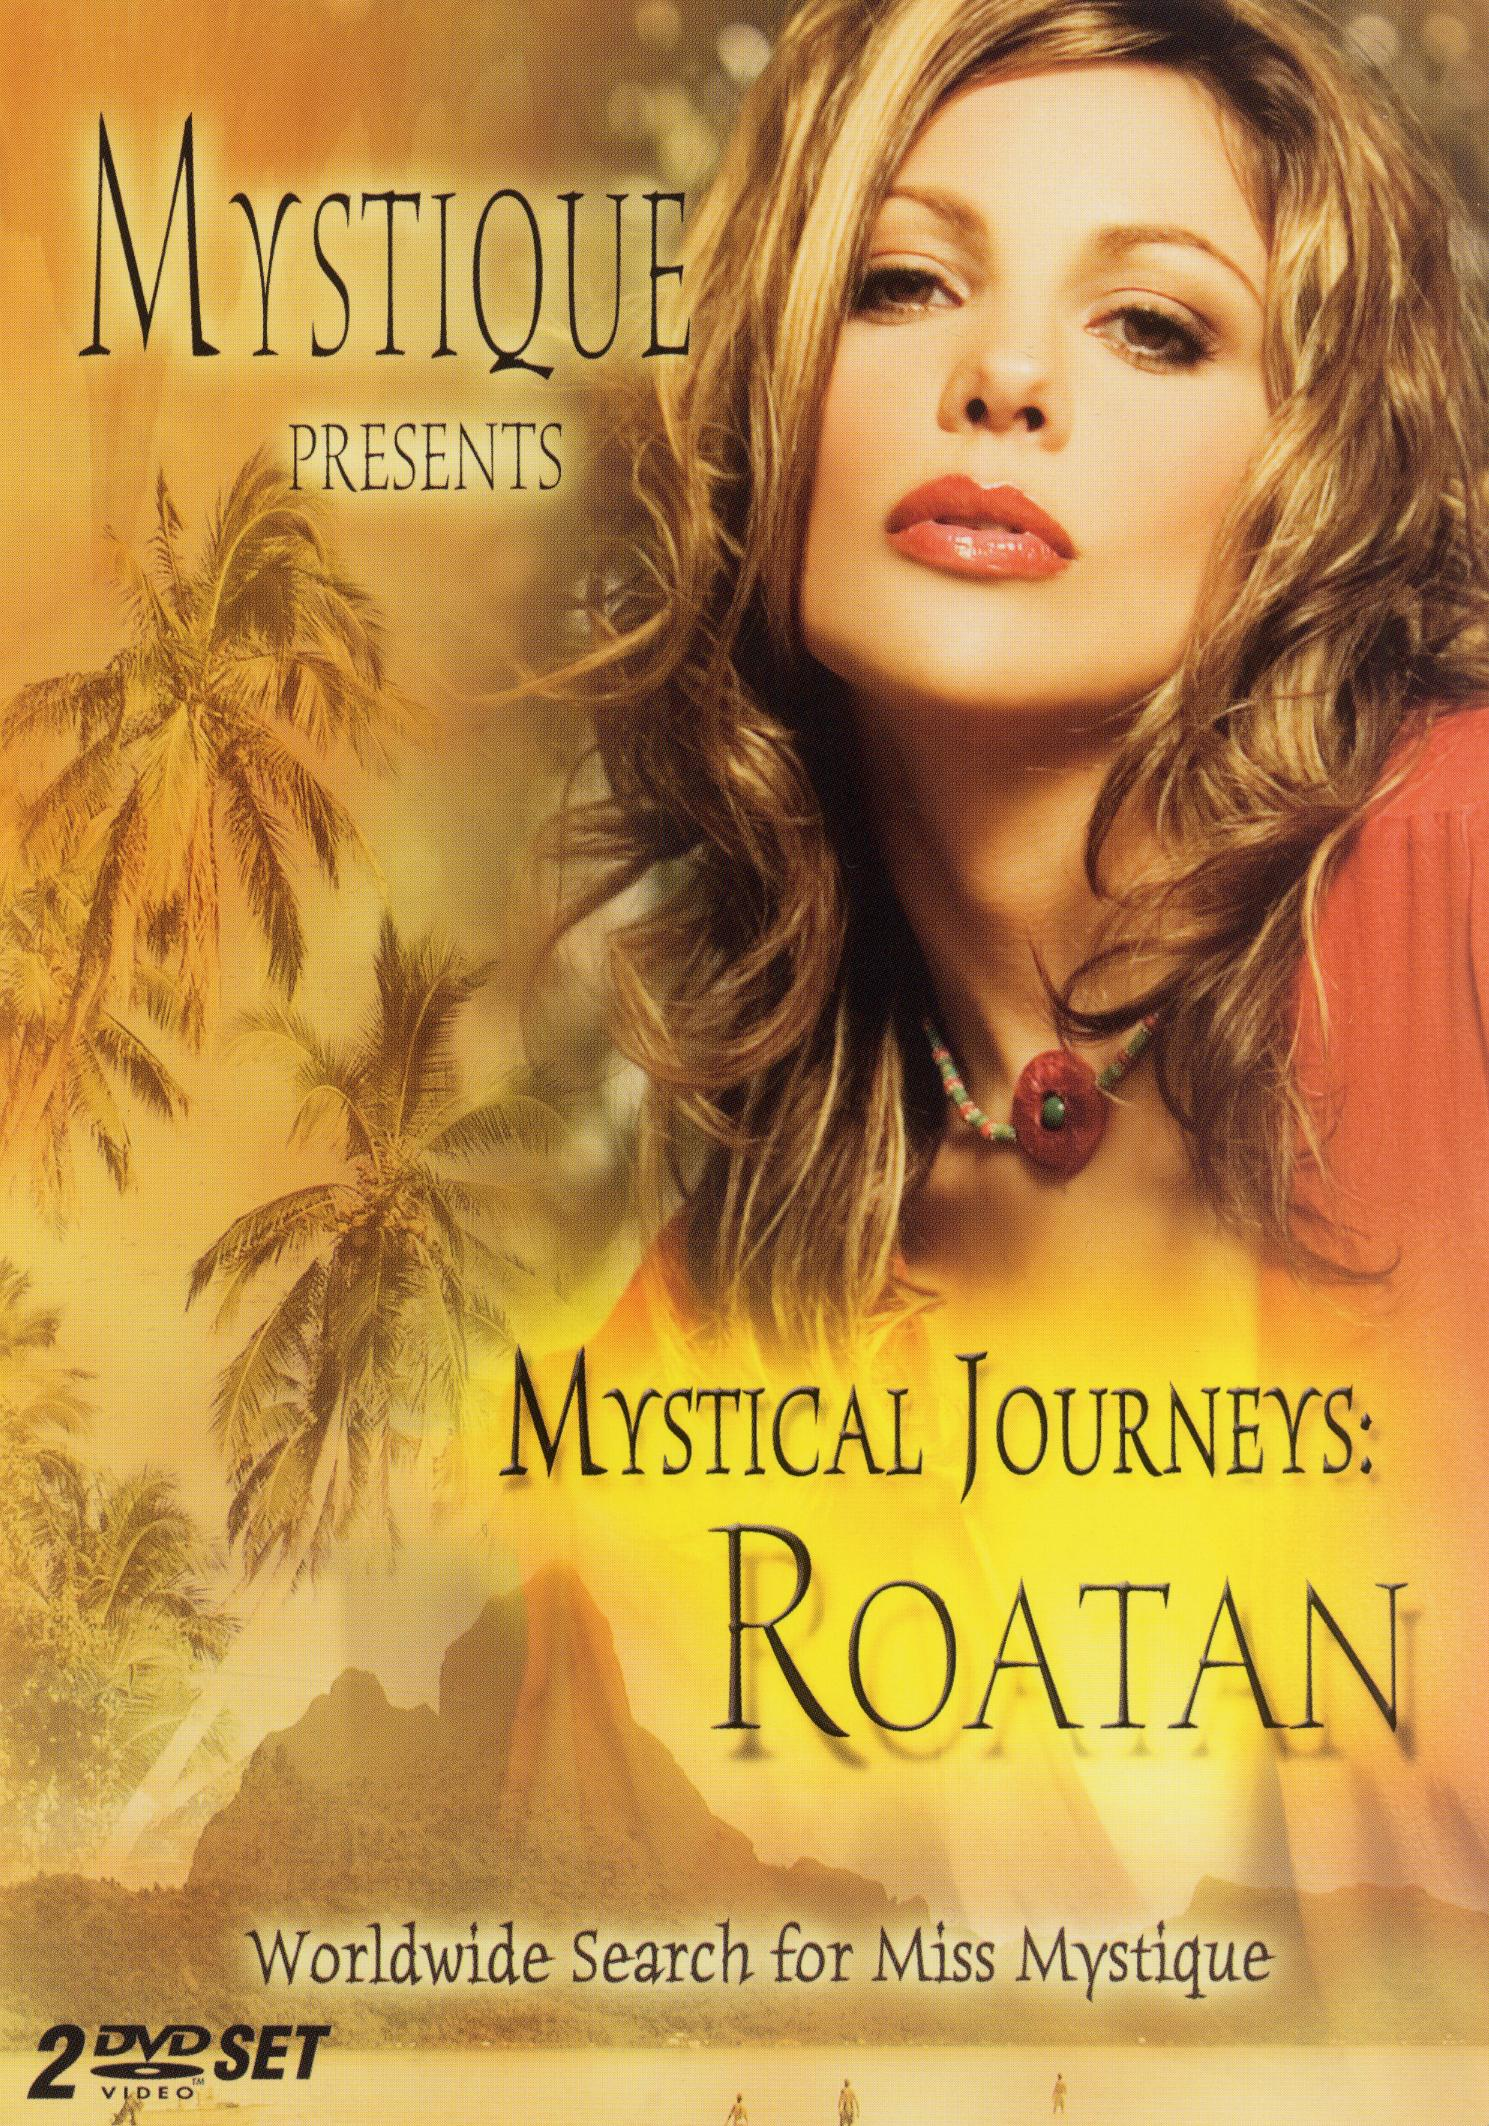 Mystique Presents: Mystical Journeys - Roatan